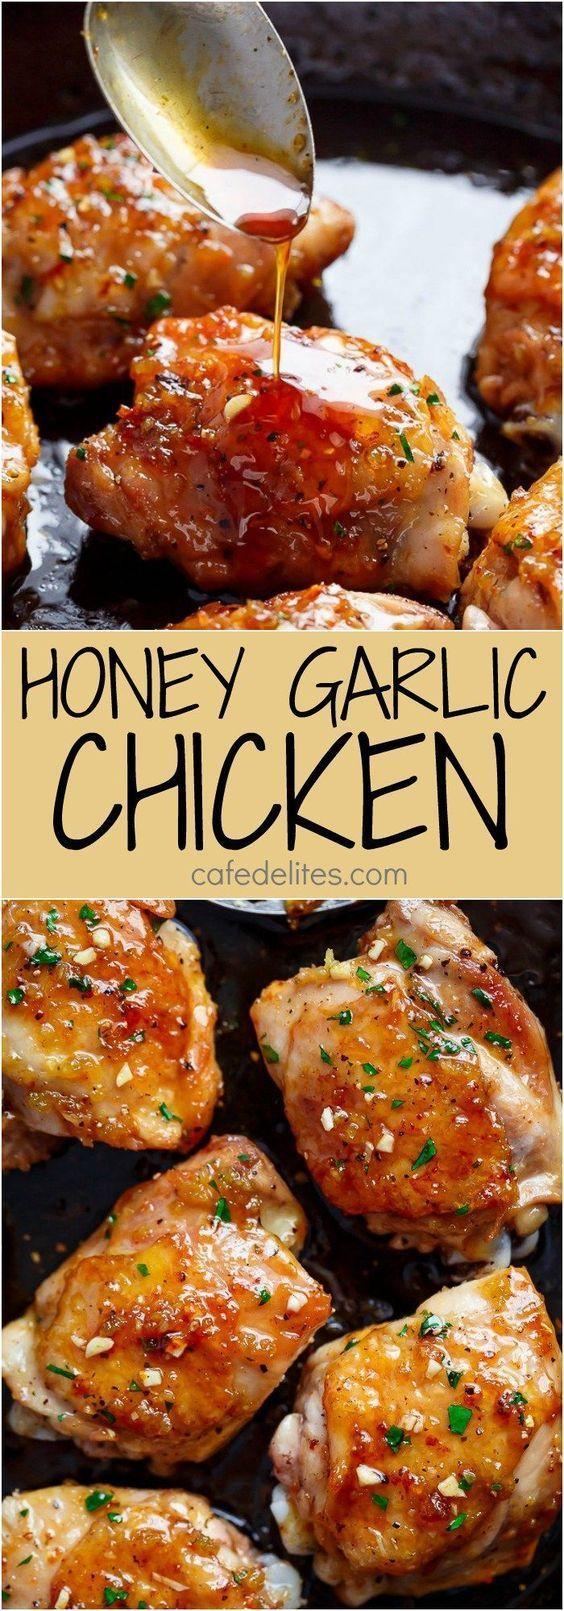 Honey Garlic Chicken. Looks amazing! Good for the family night dinner.